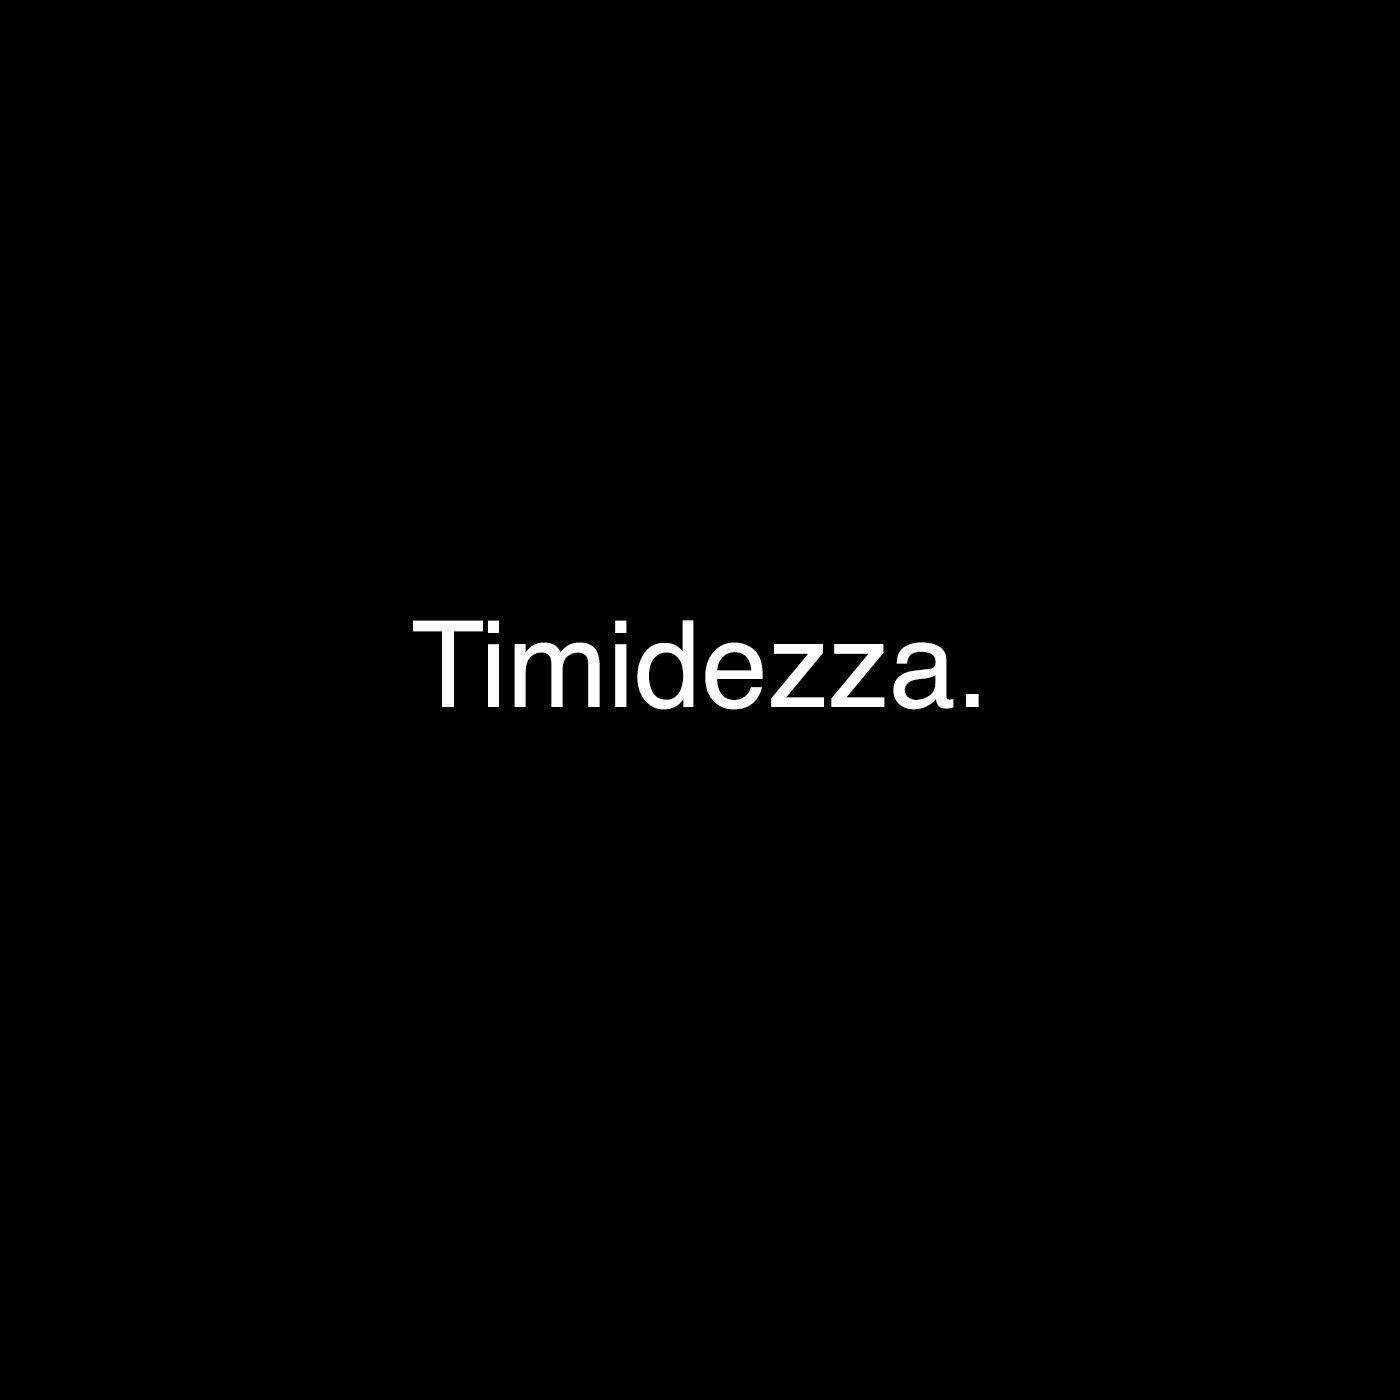 Timidezza.